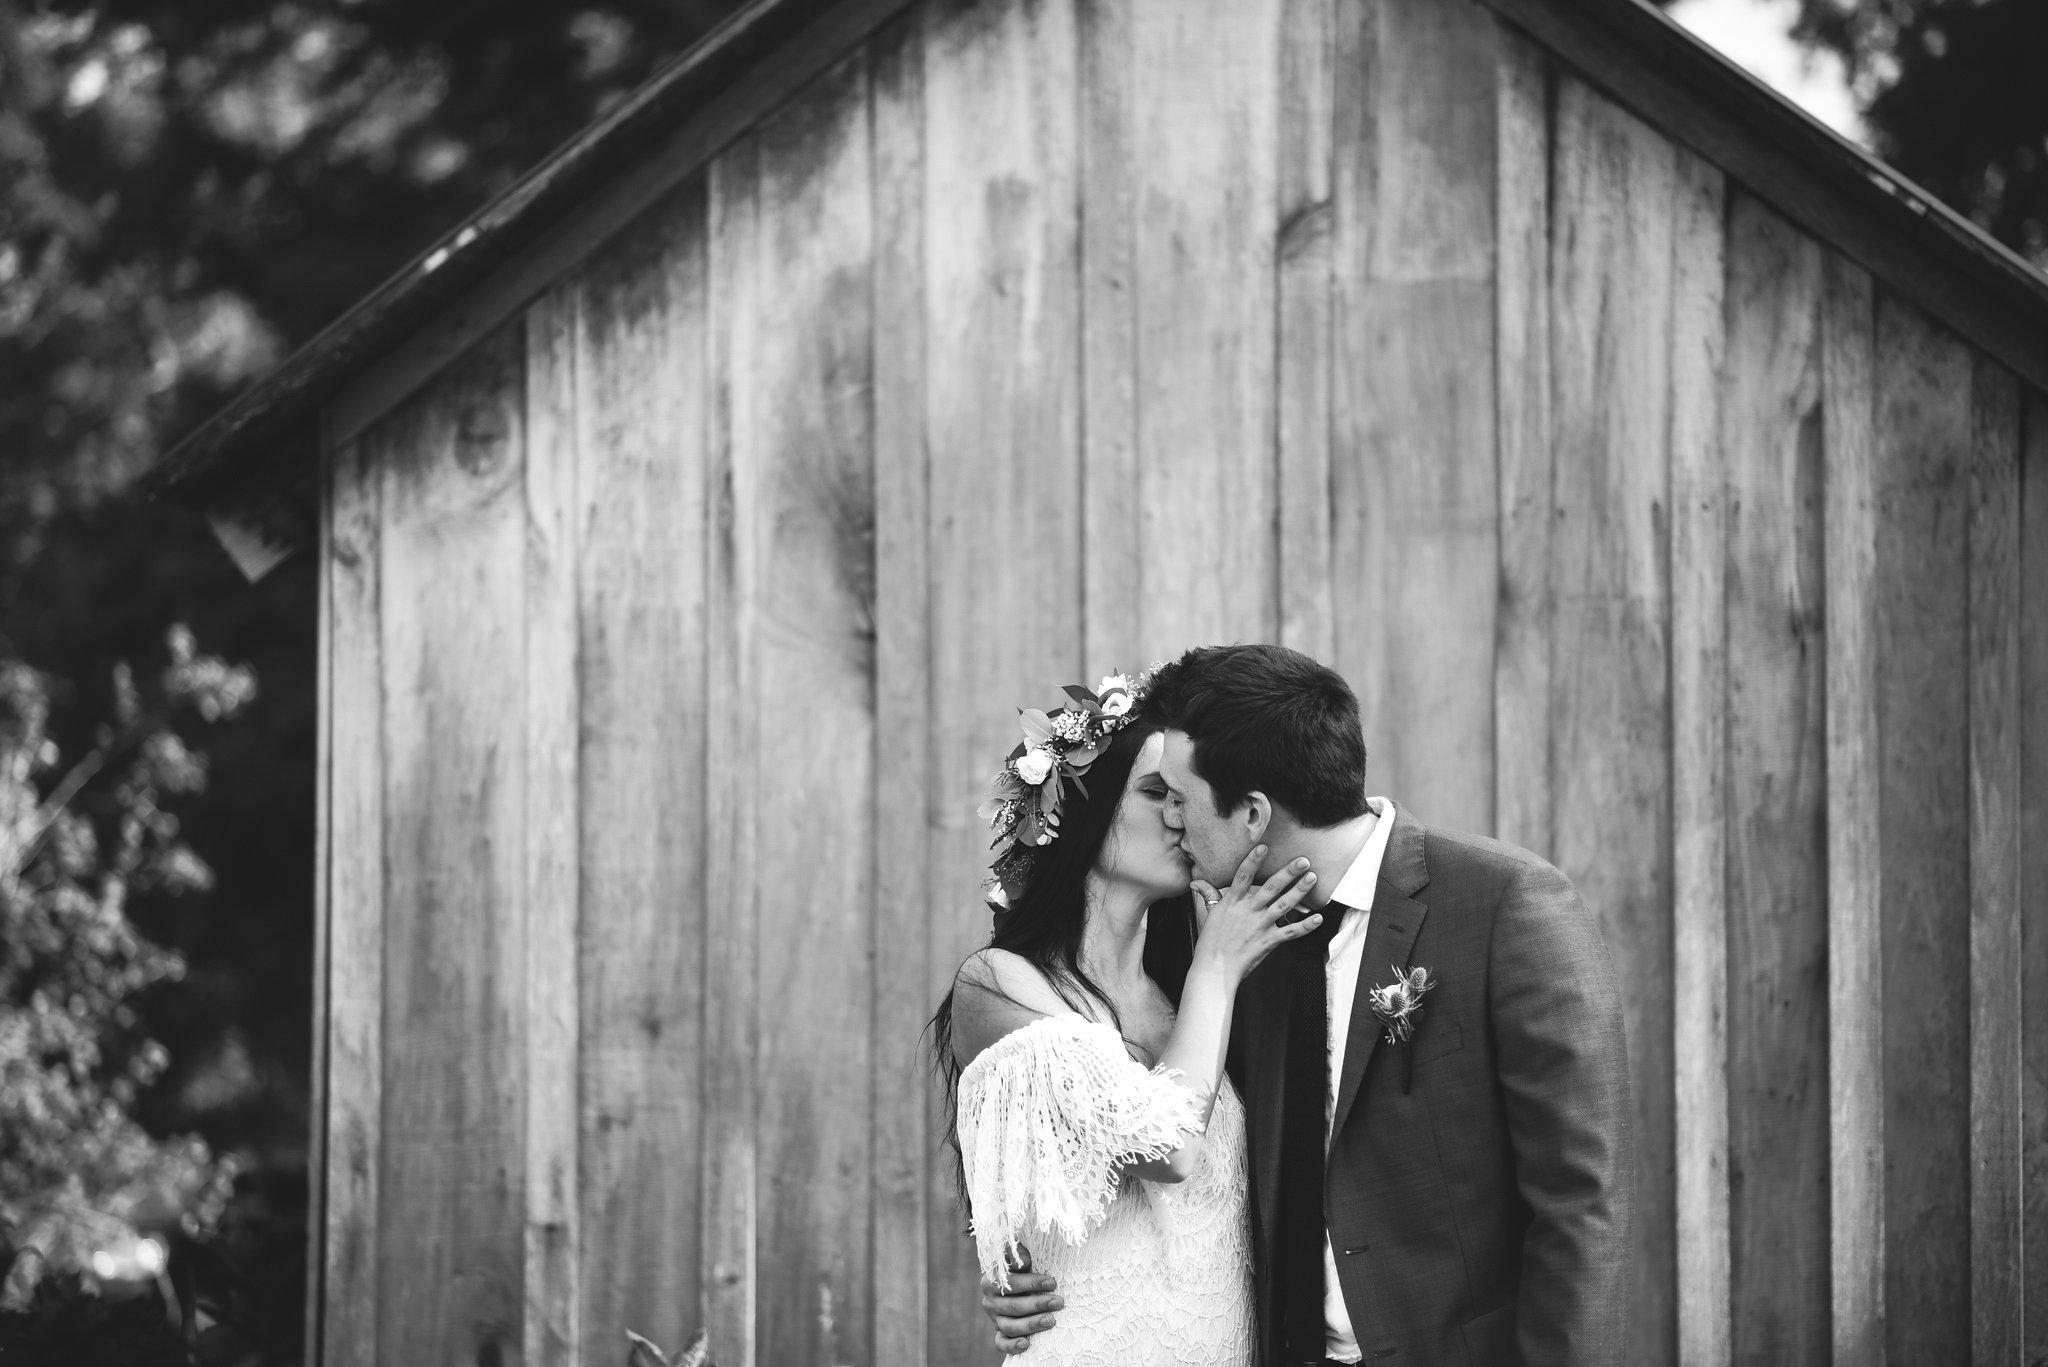 Maryland, Eastern Shore, Baltimore Wedding Photographer, Romantic, Boho, Backyard Wedding, Nature, Black and White Photo, Bride and Groom Kissing, Michael Designs Florist, Daughters of Simone Dress